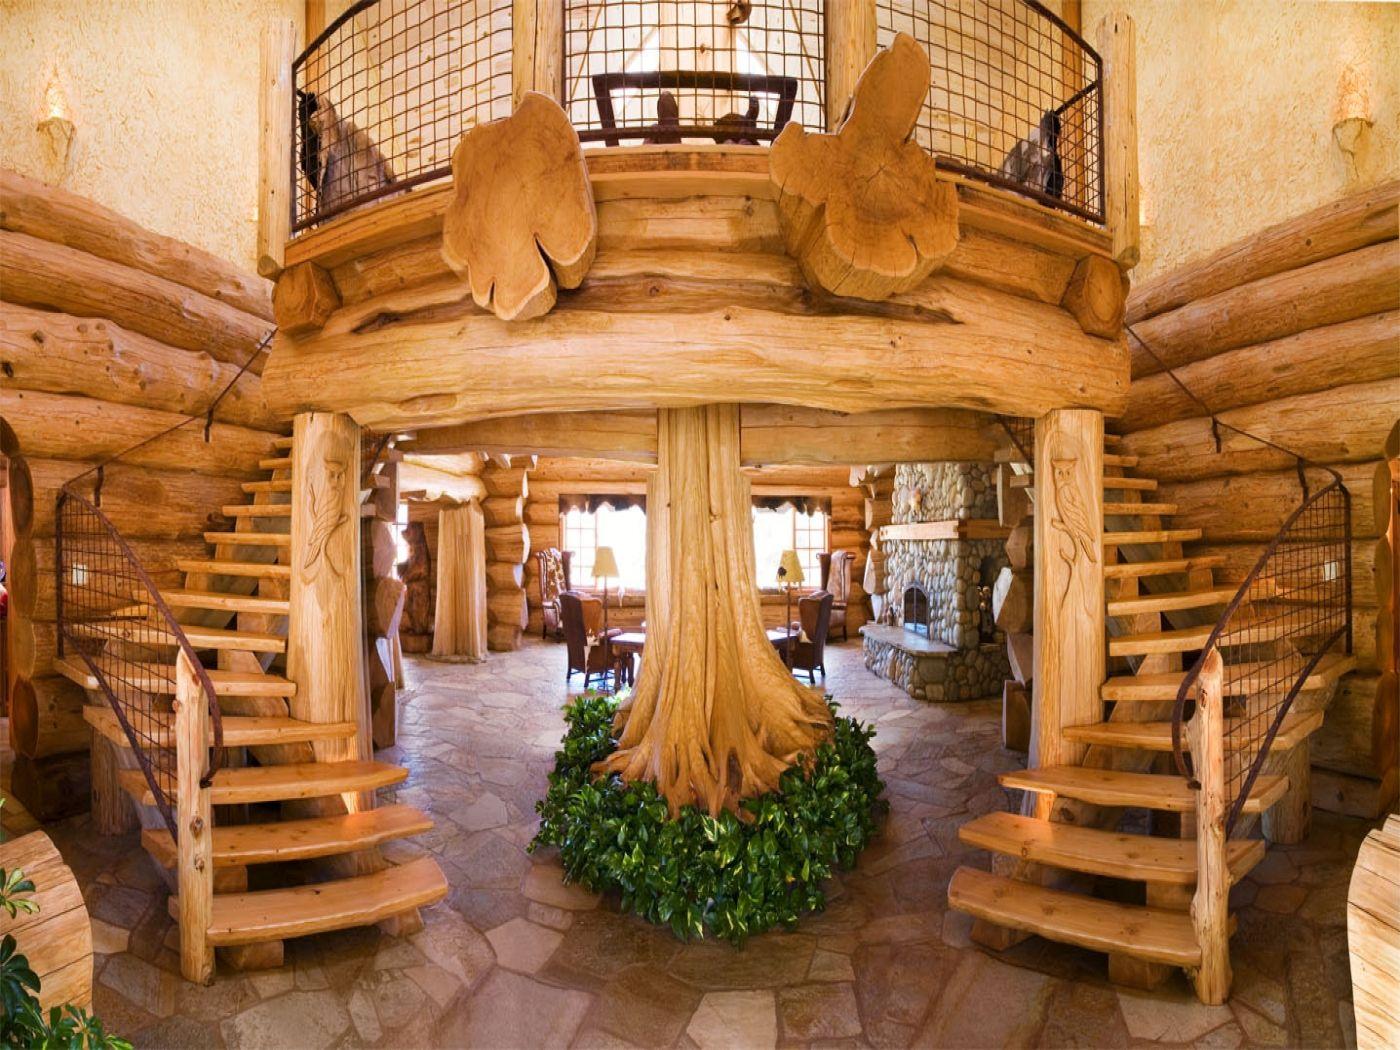 1400x1050 Luxury Log Home Plans Contemporary Artistic Design Ideas Jpg 1400 1050 Log Home Interiors Log Homes Luxury Log Cabins